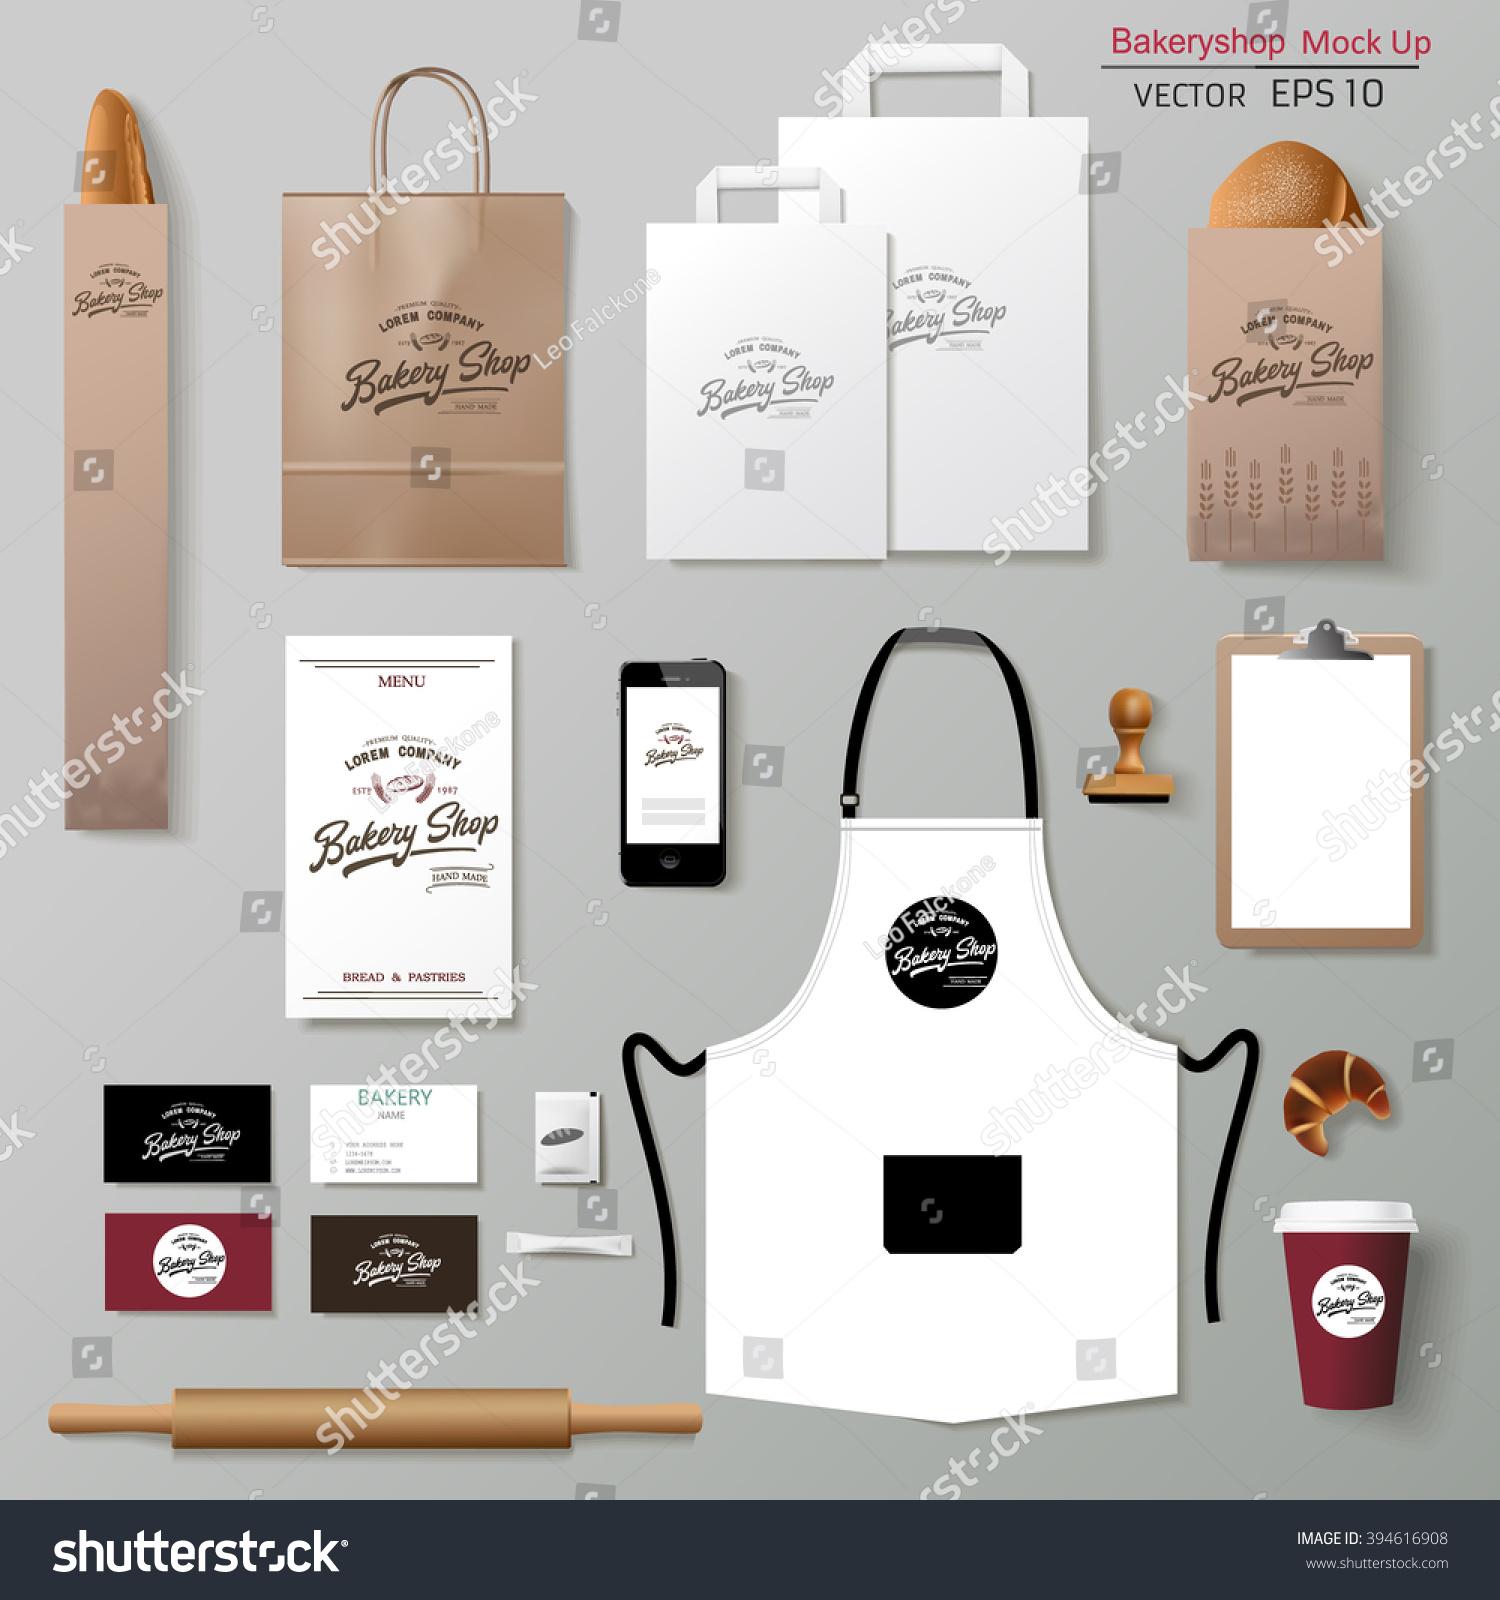 Vector Bakery Corporate Branding Identity Template Stock Vector